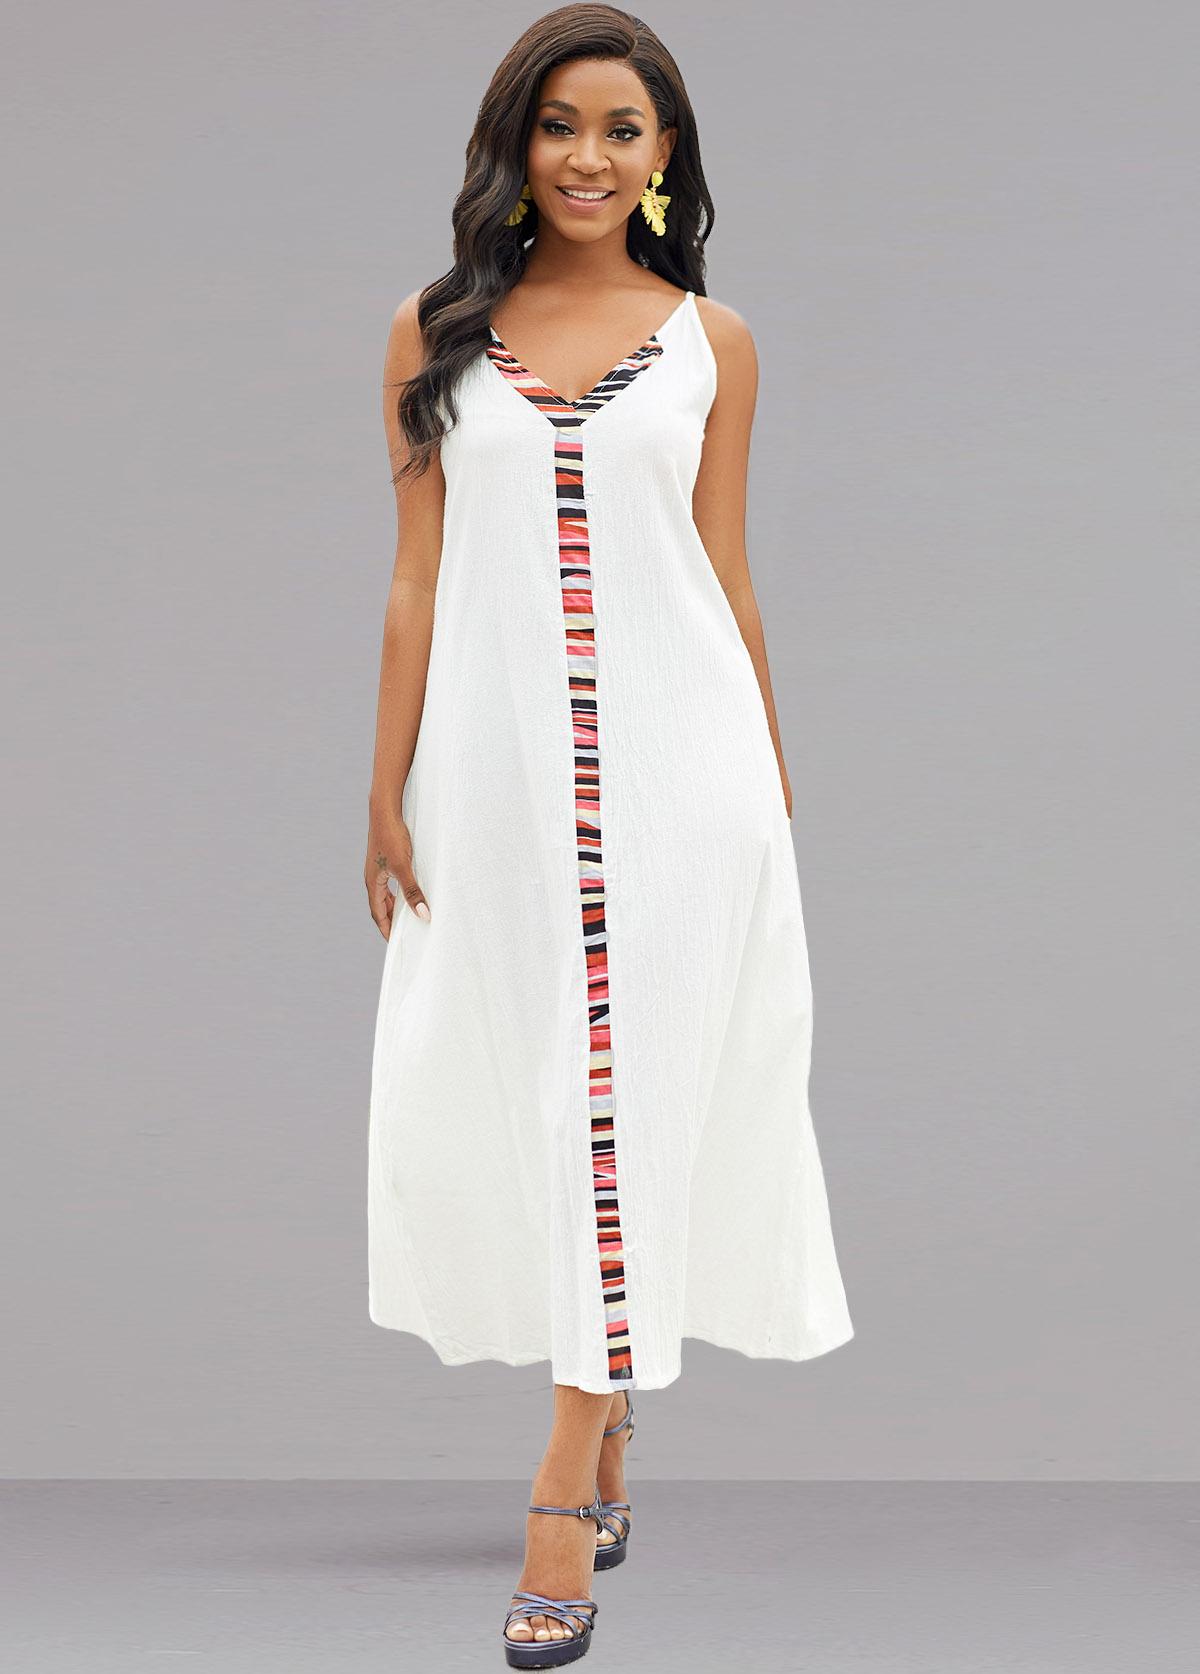 V Neck Rainbow Stripe Sleeveless Dress